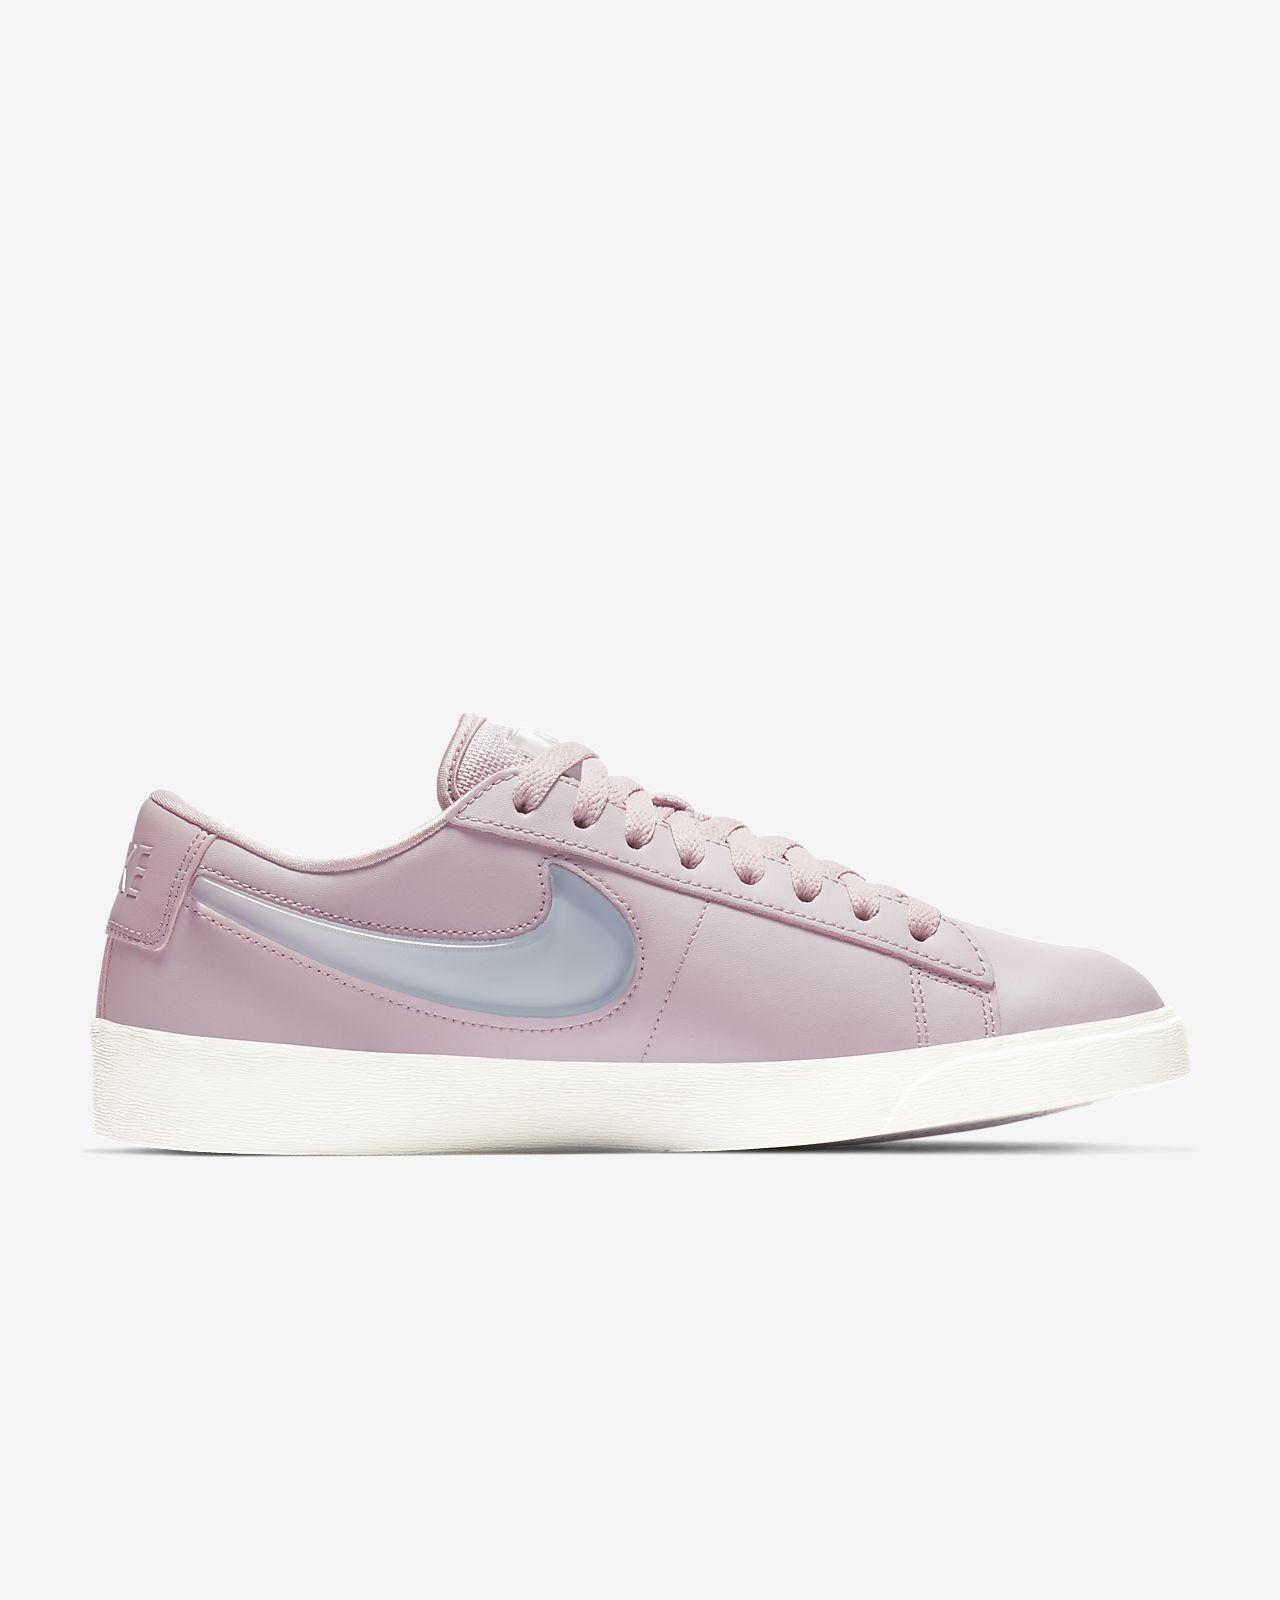 131846e35 Nike Blazer Low Lux Premium Women s Shoe. Nike.com